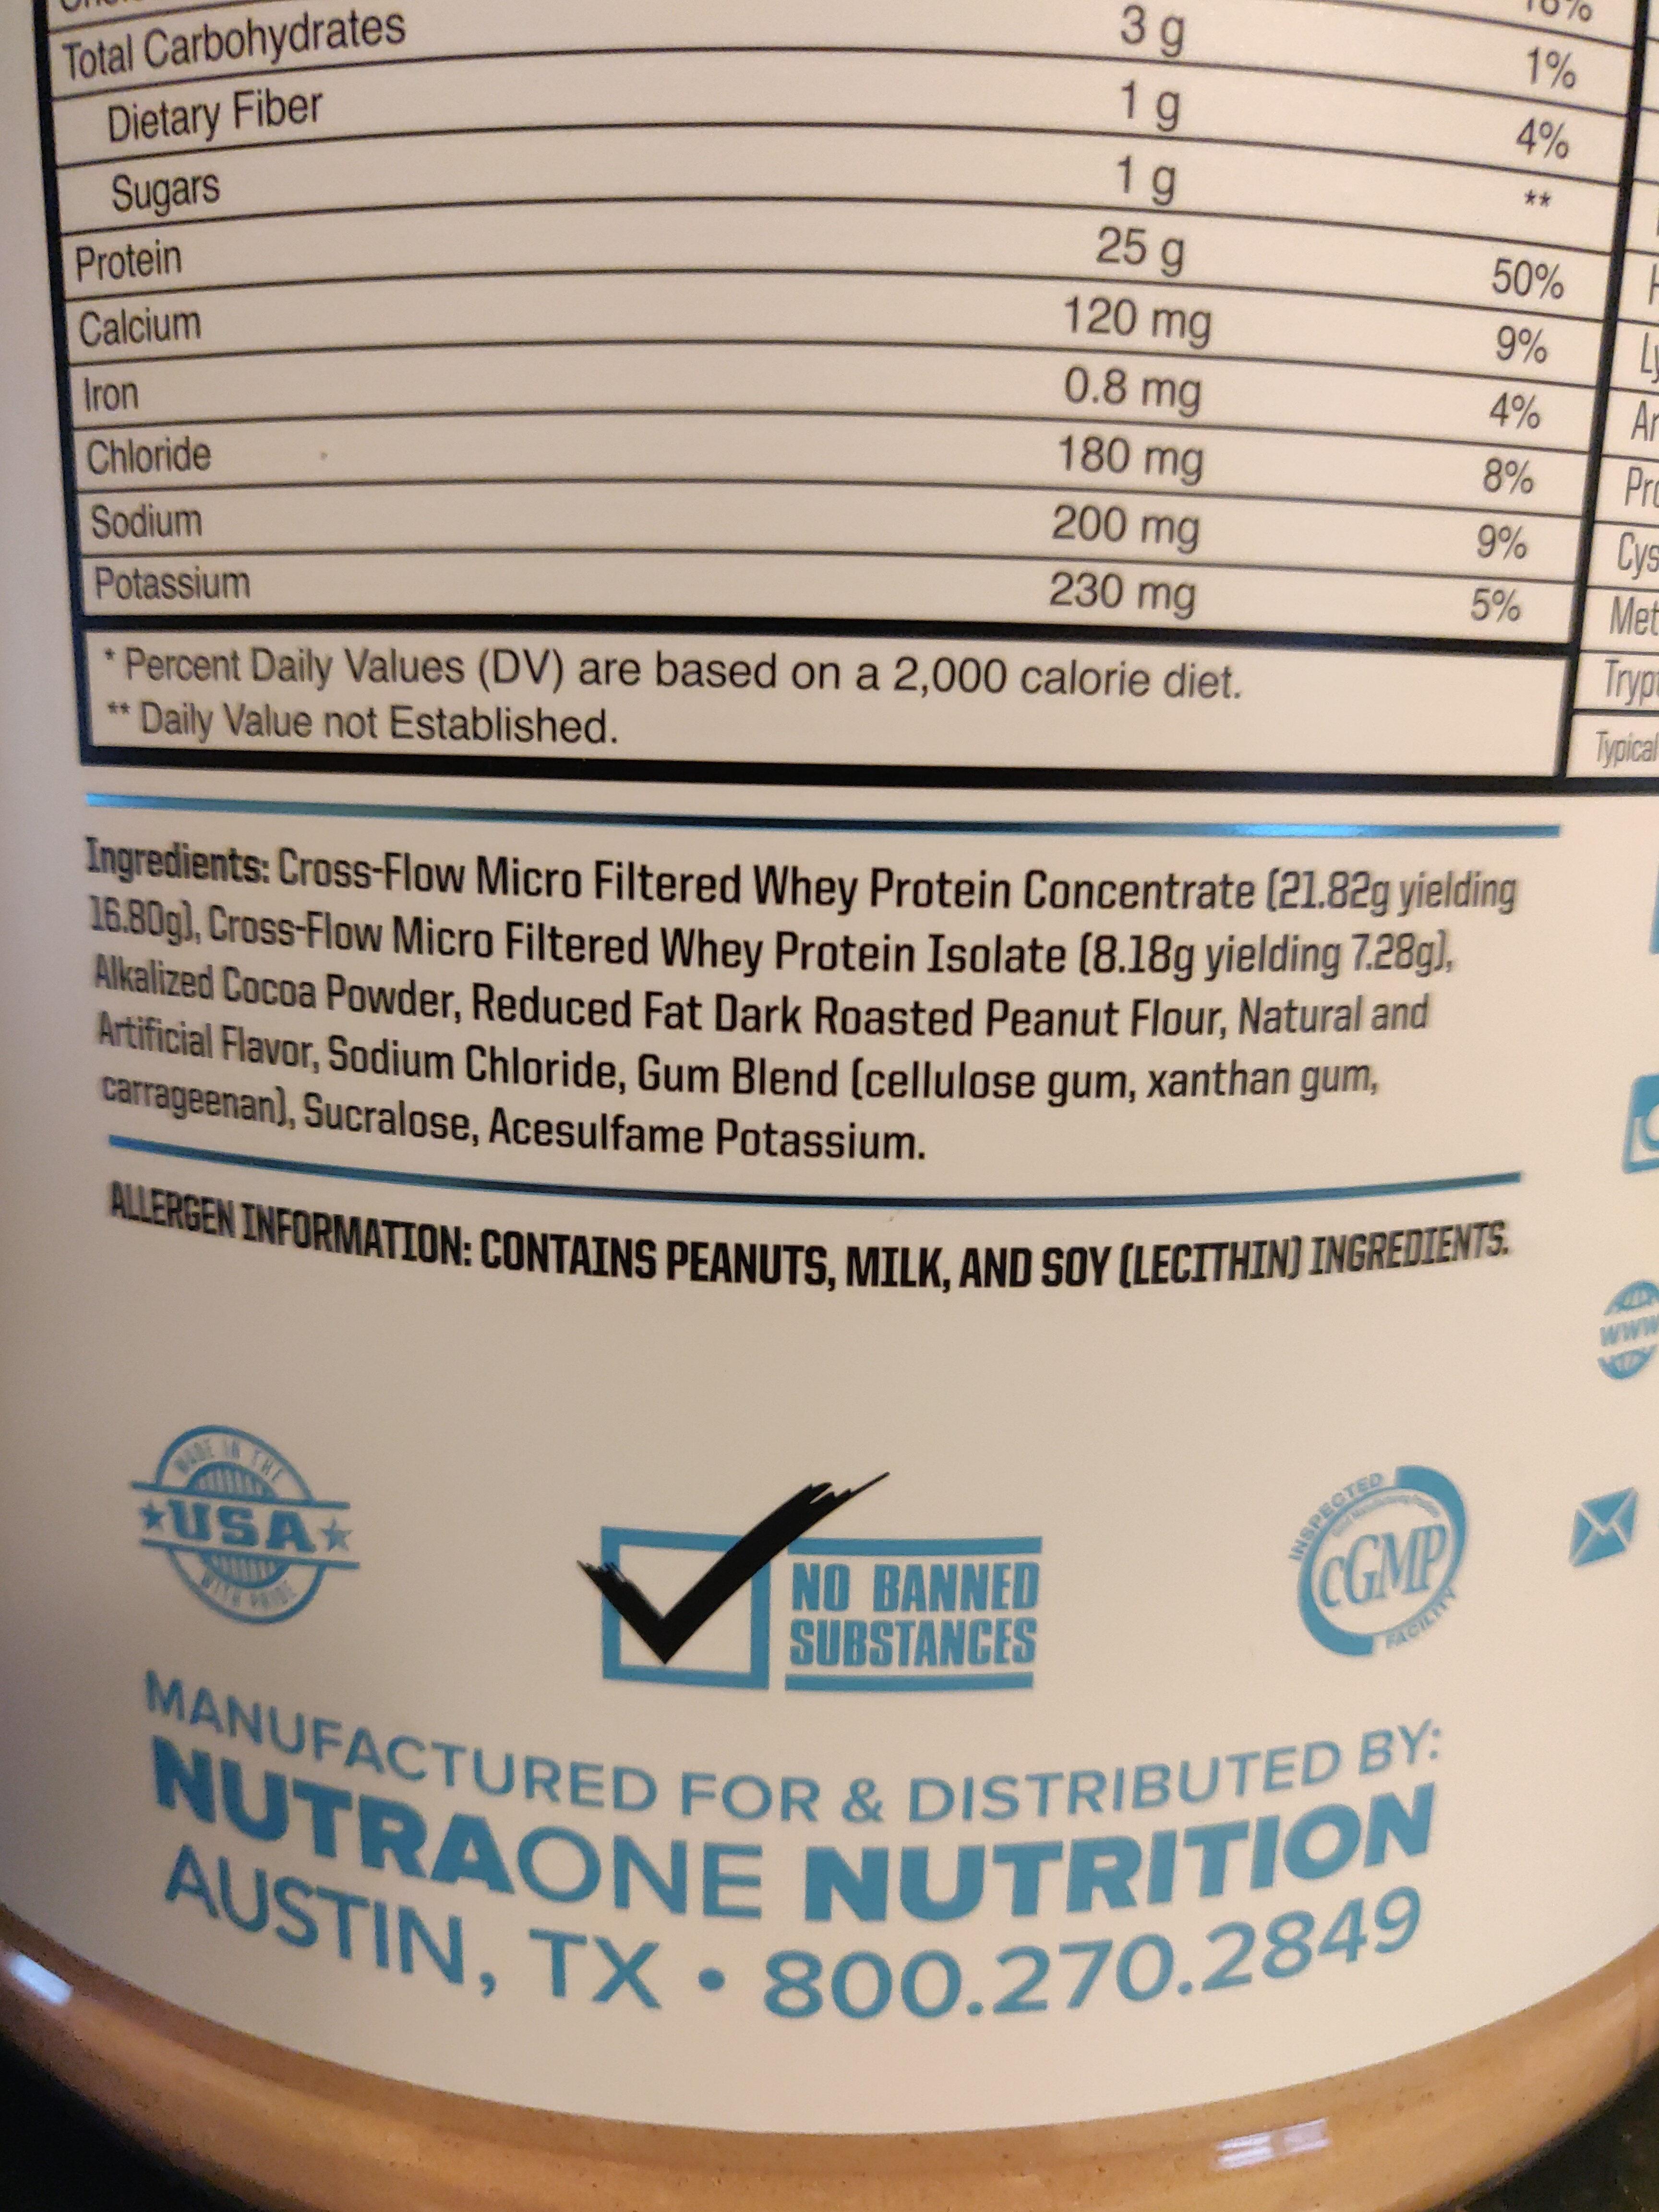 ProteinOne, Peanut Butter Cup - Ingredients - en